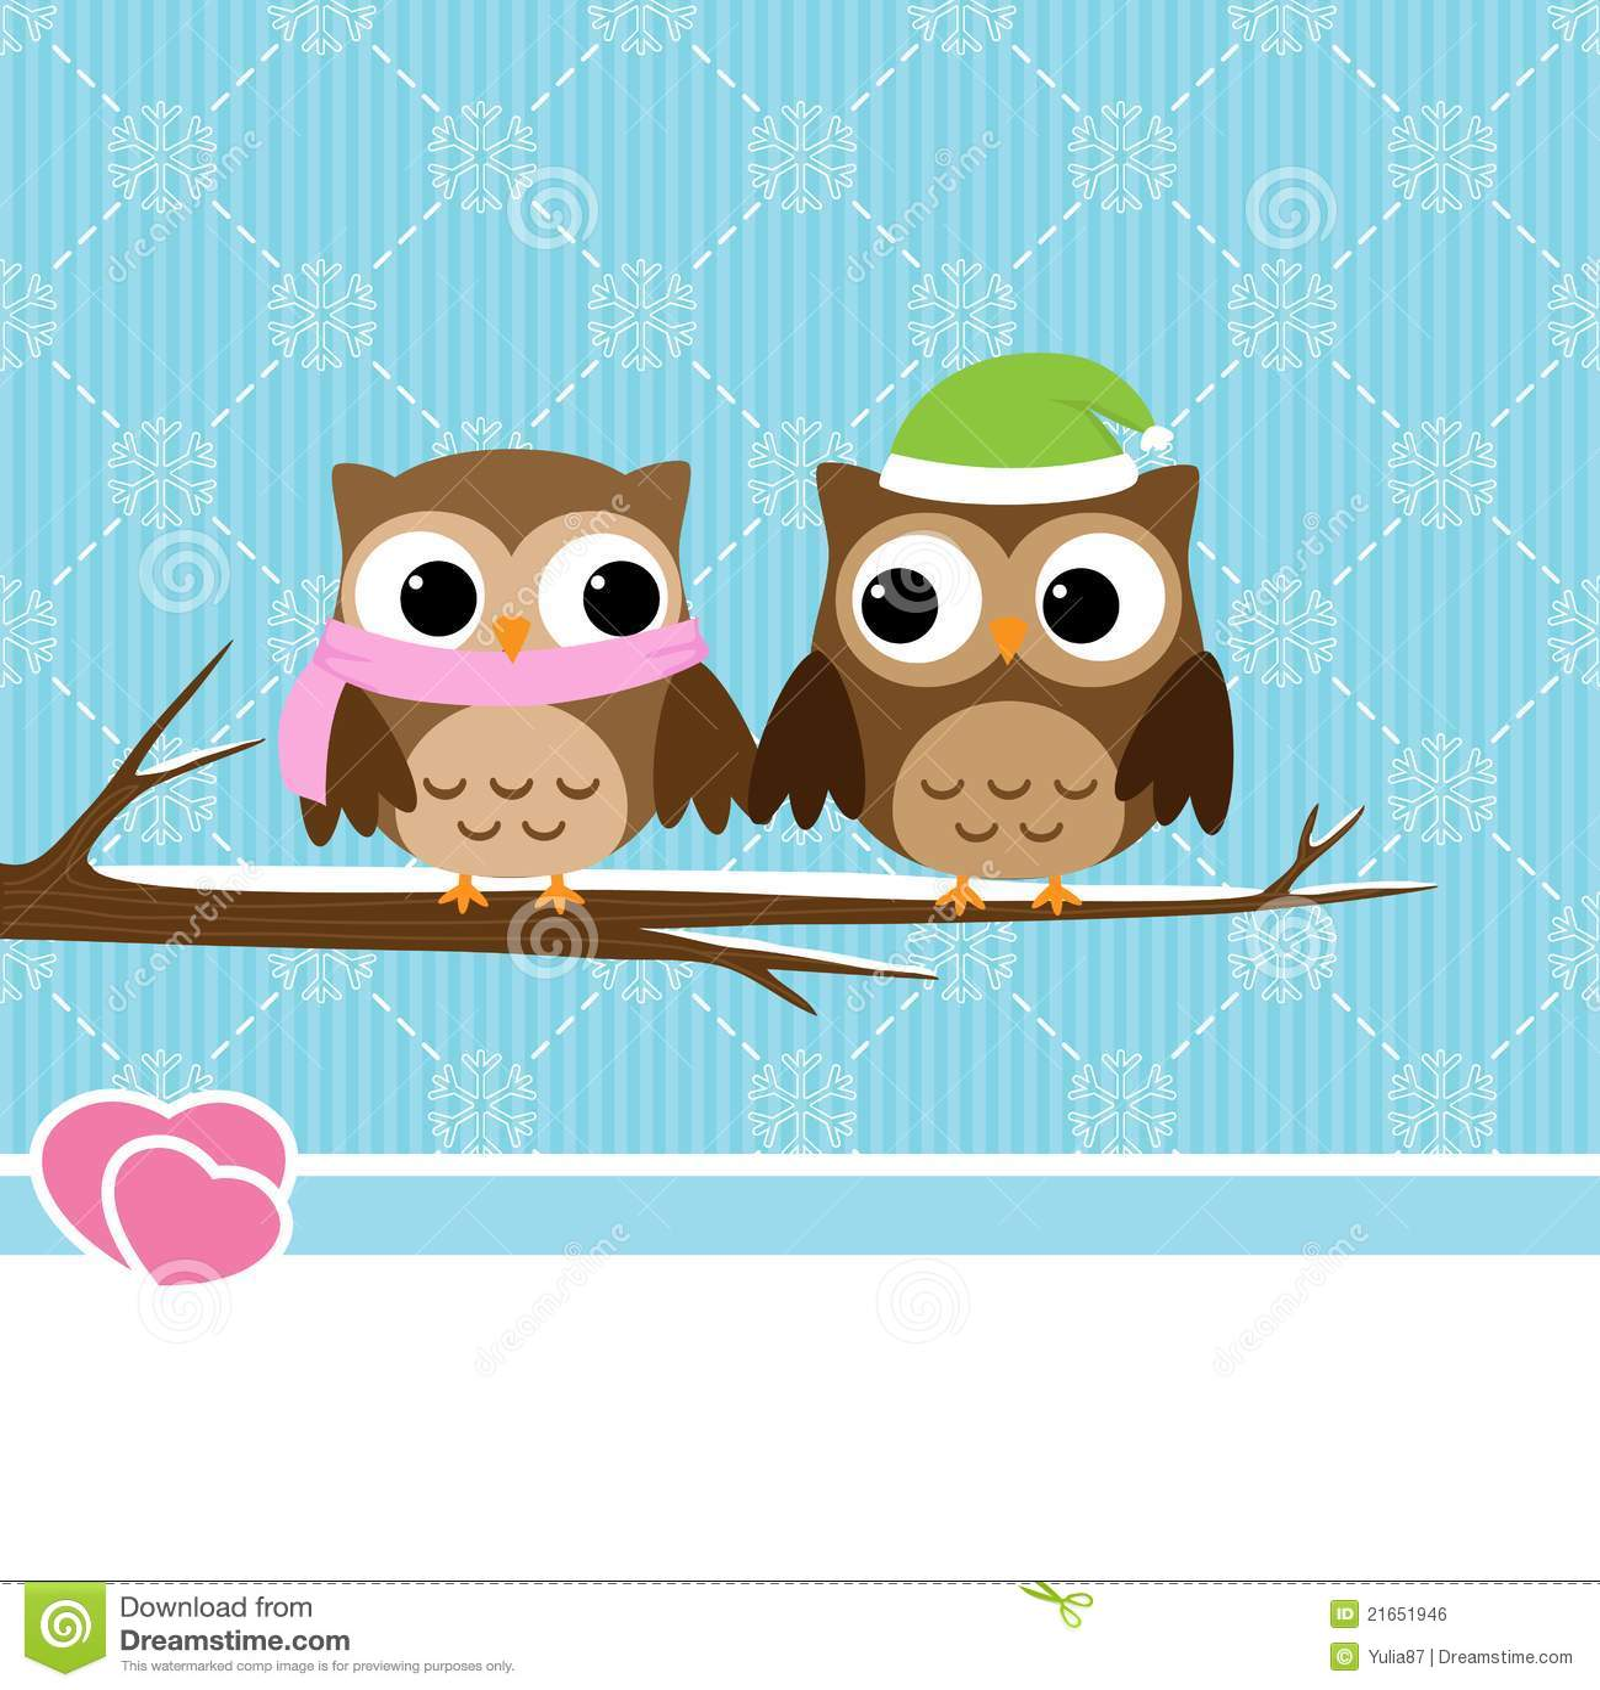 Winter Owl Couple Royalty Free Stock Image - Image: 21651946